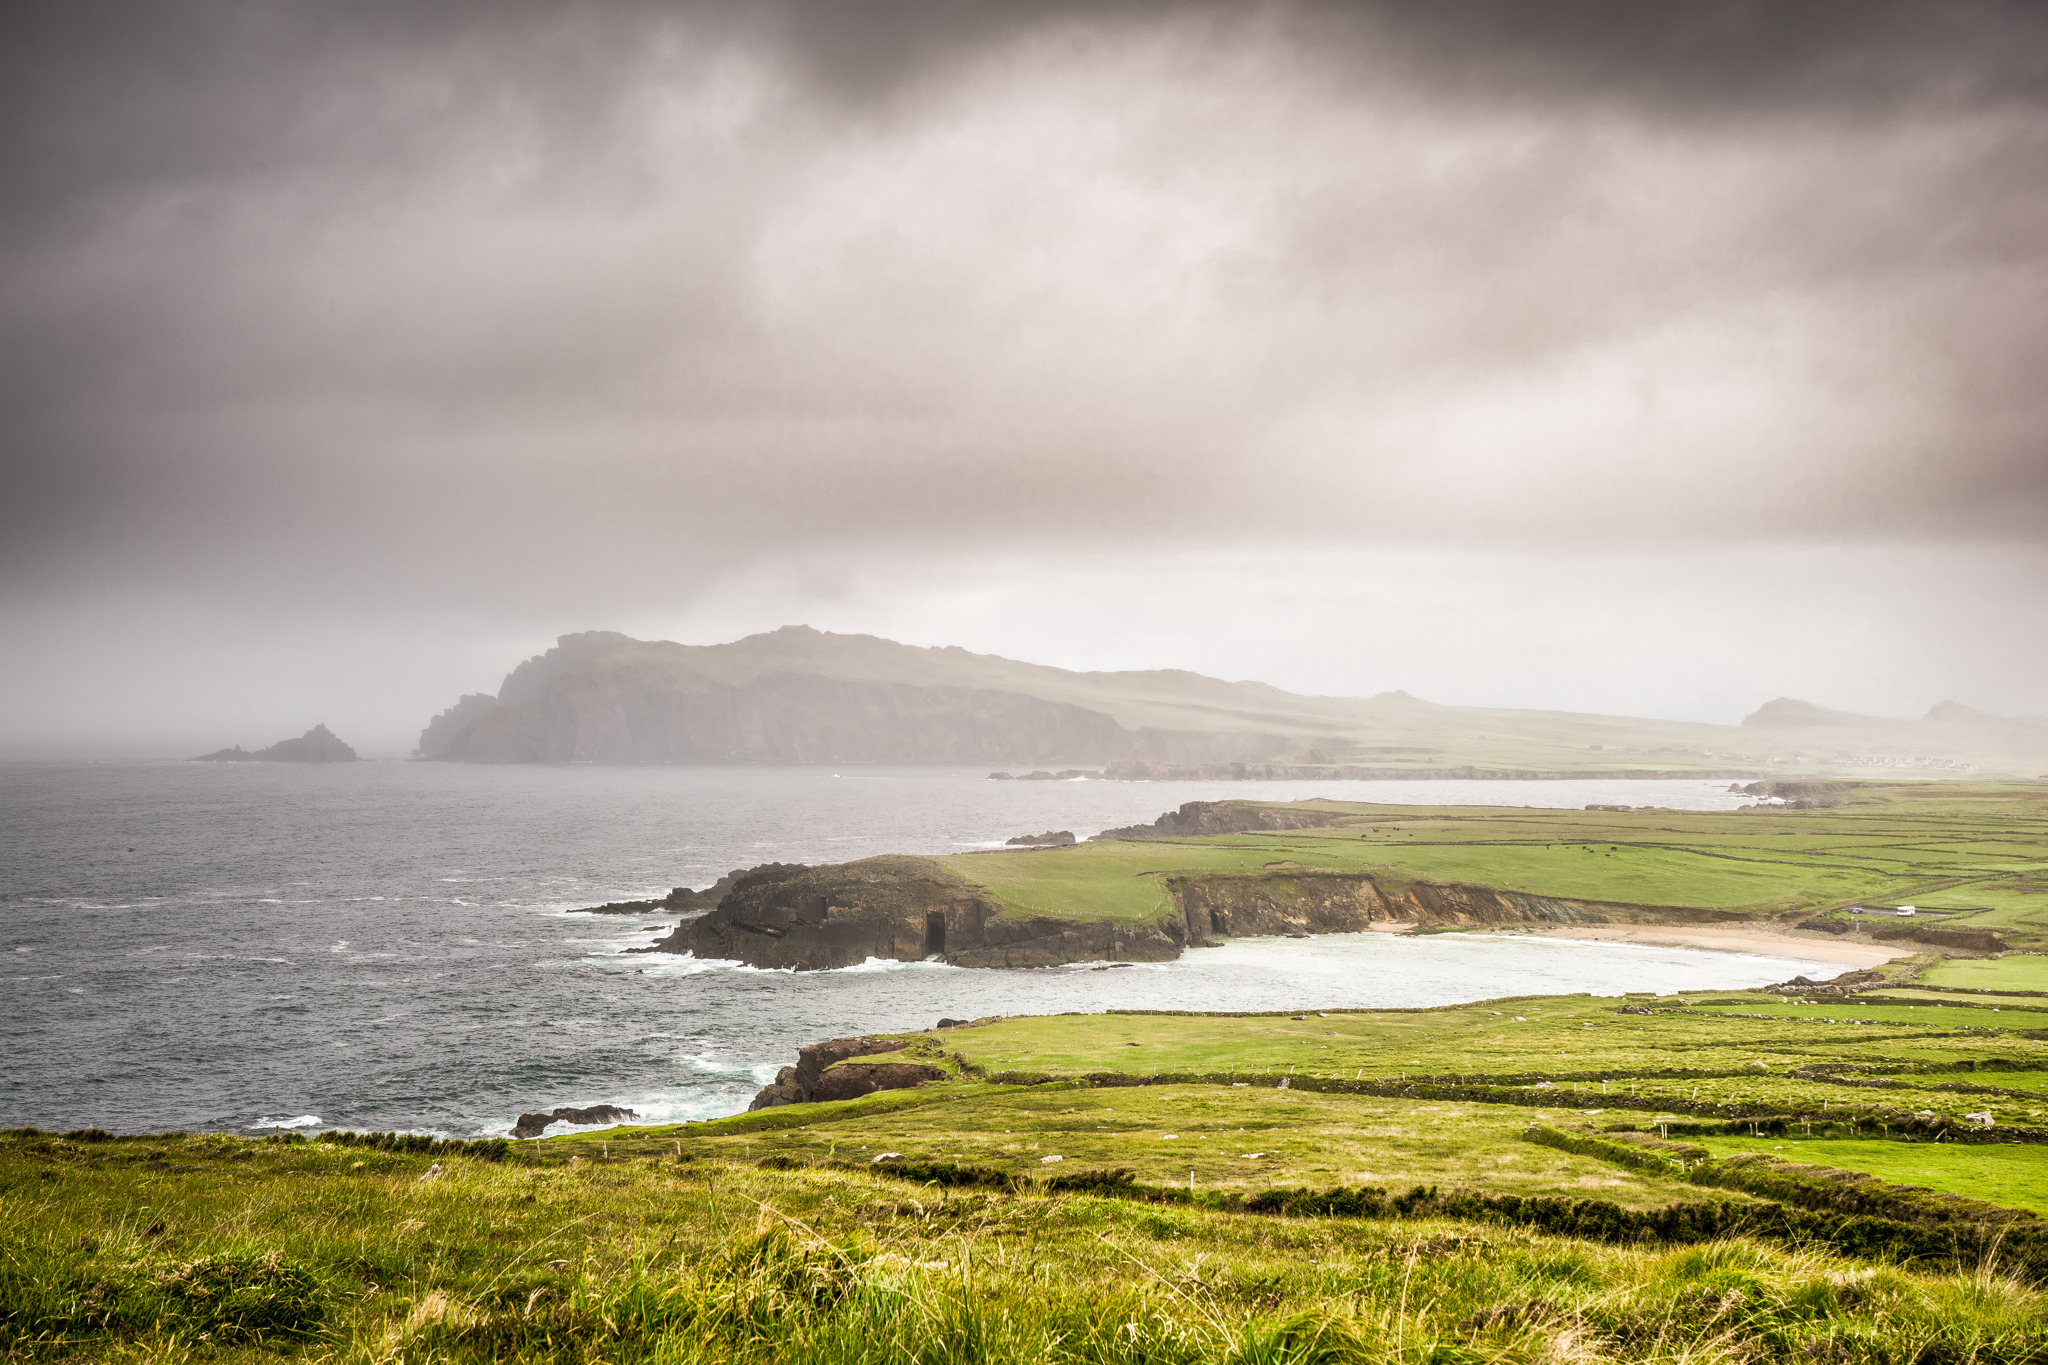 Photograph of a foggy coast of Ireland